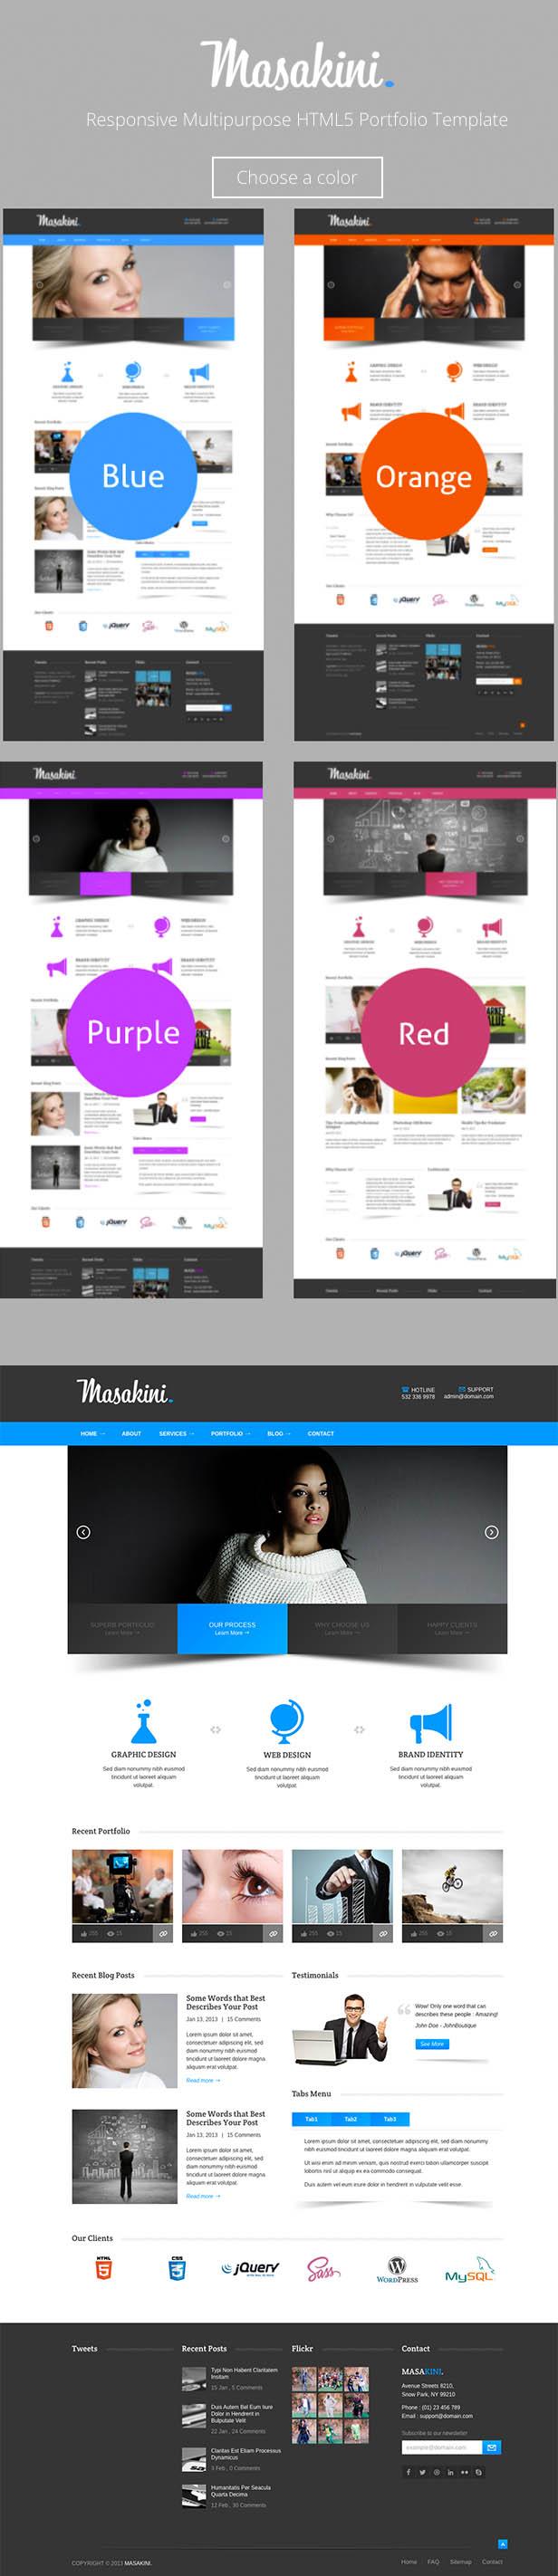 Masakini Multi-purpose Responsive HTML Template - 9